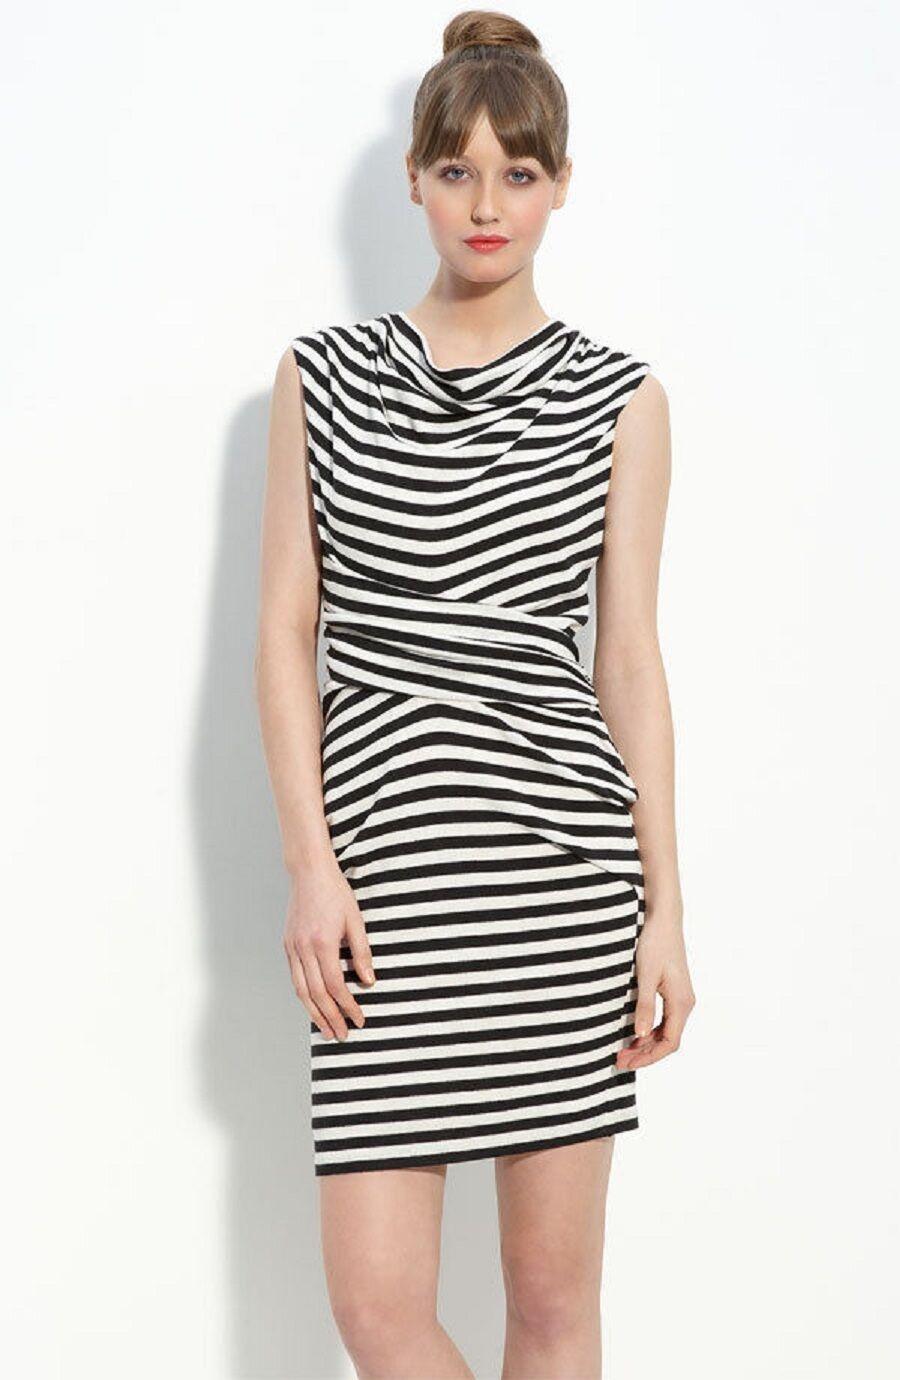 NEW JULIE DILLON Stripe Jersey Sheath DRESS Size 6 NORDSTROM